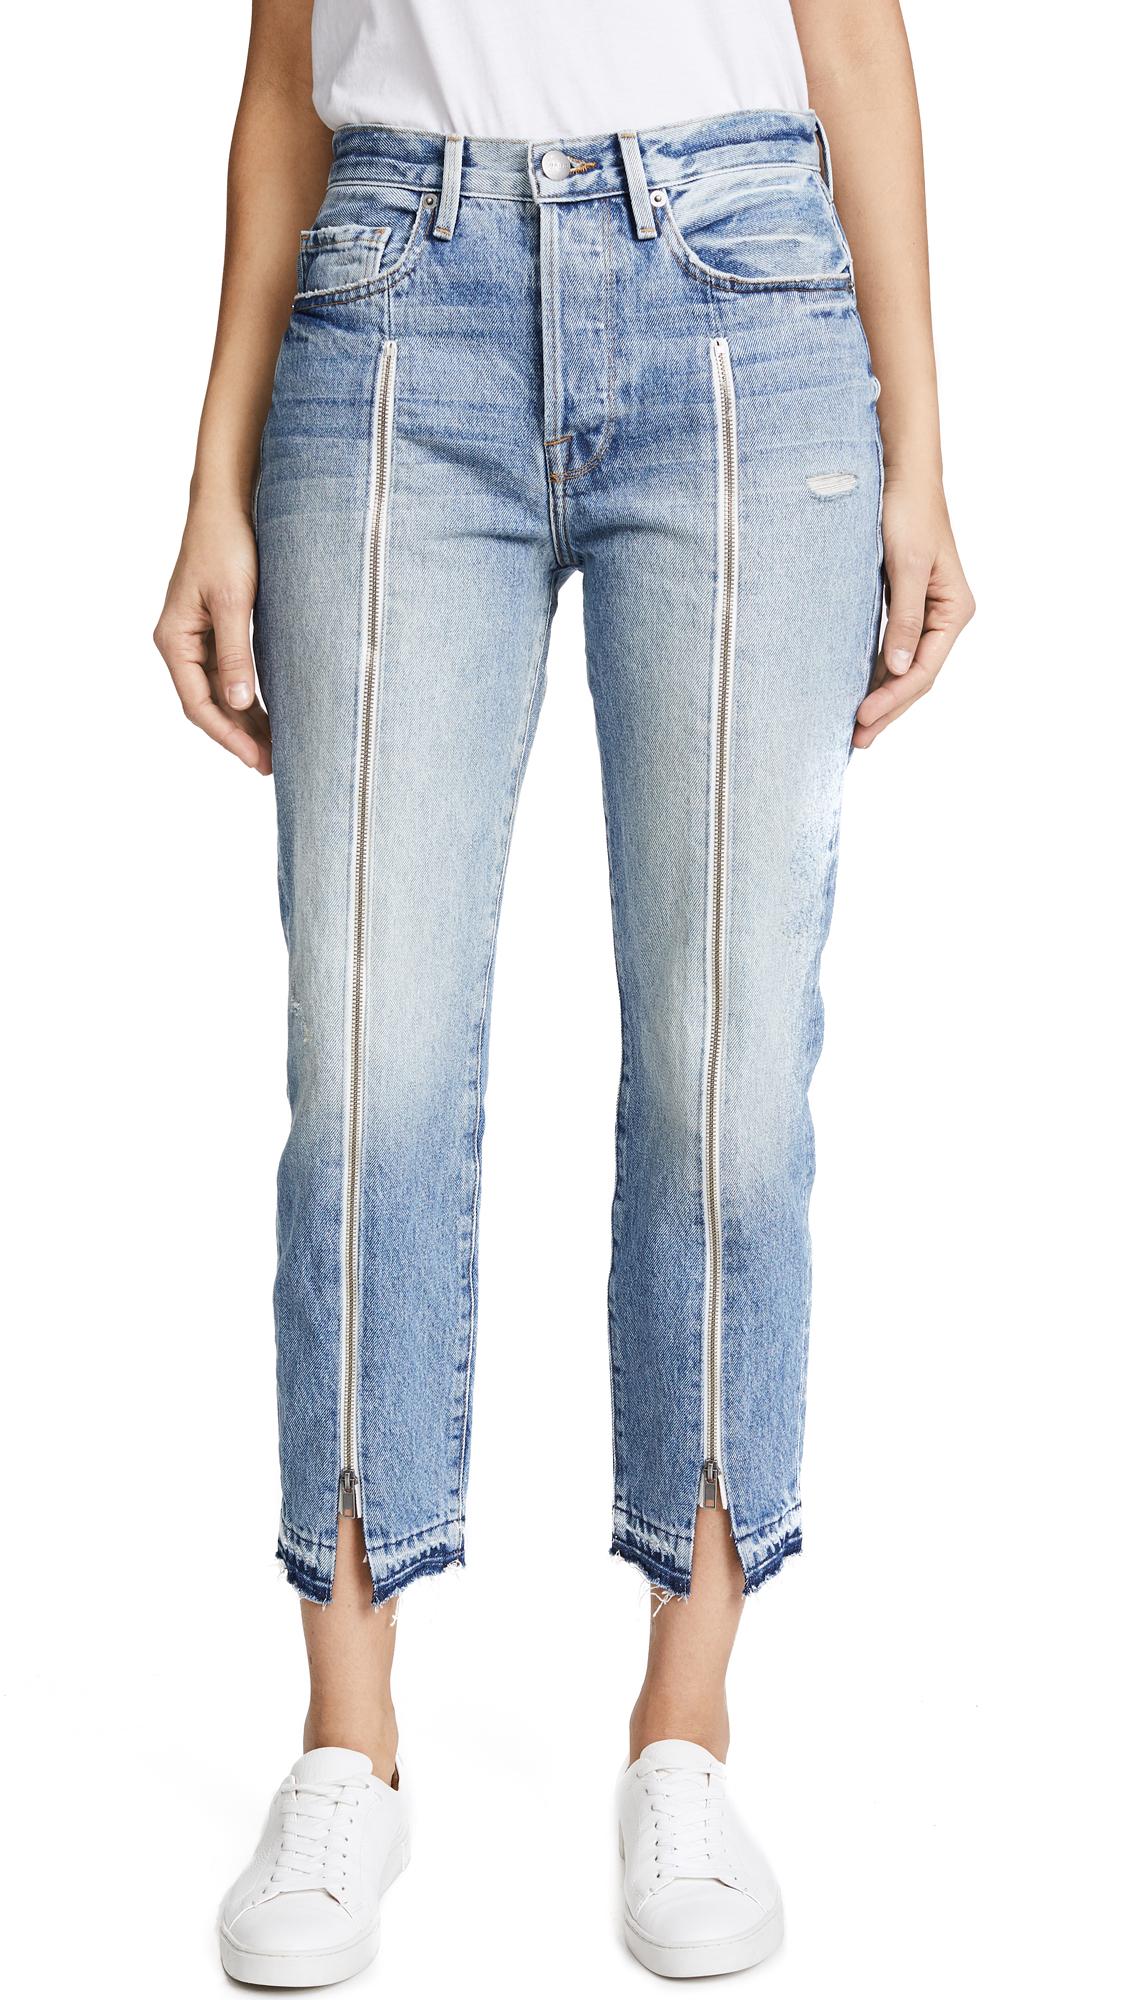 FRAME Le Original Jeans with Zipper - Fairplex